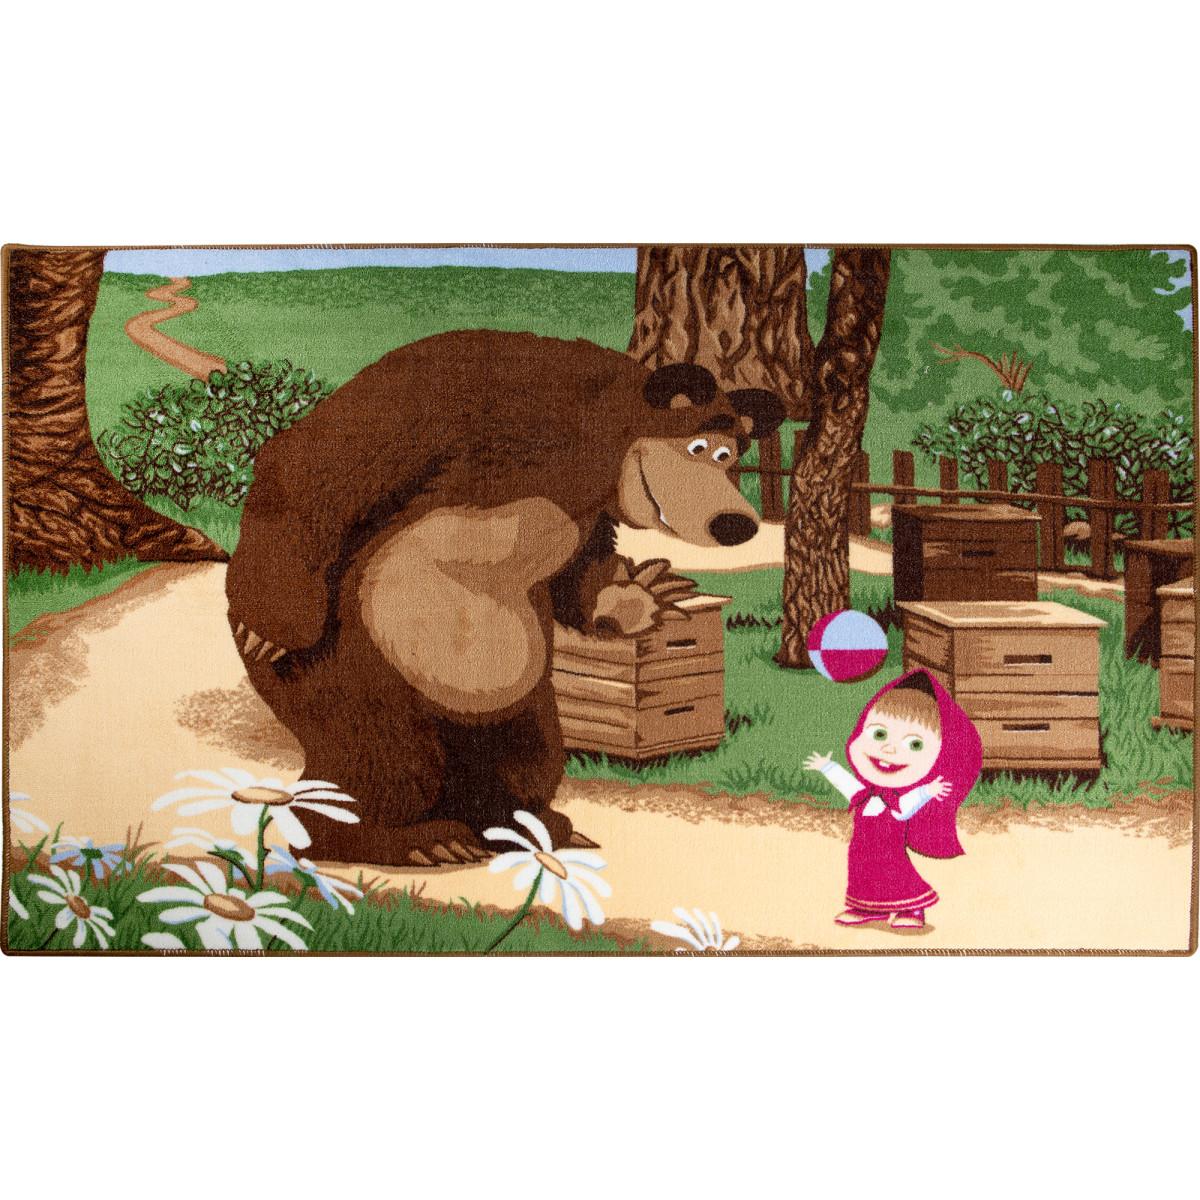 Ковер Маша и Медведь с мячом размер 1х15 м